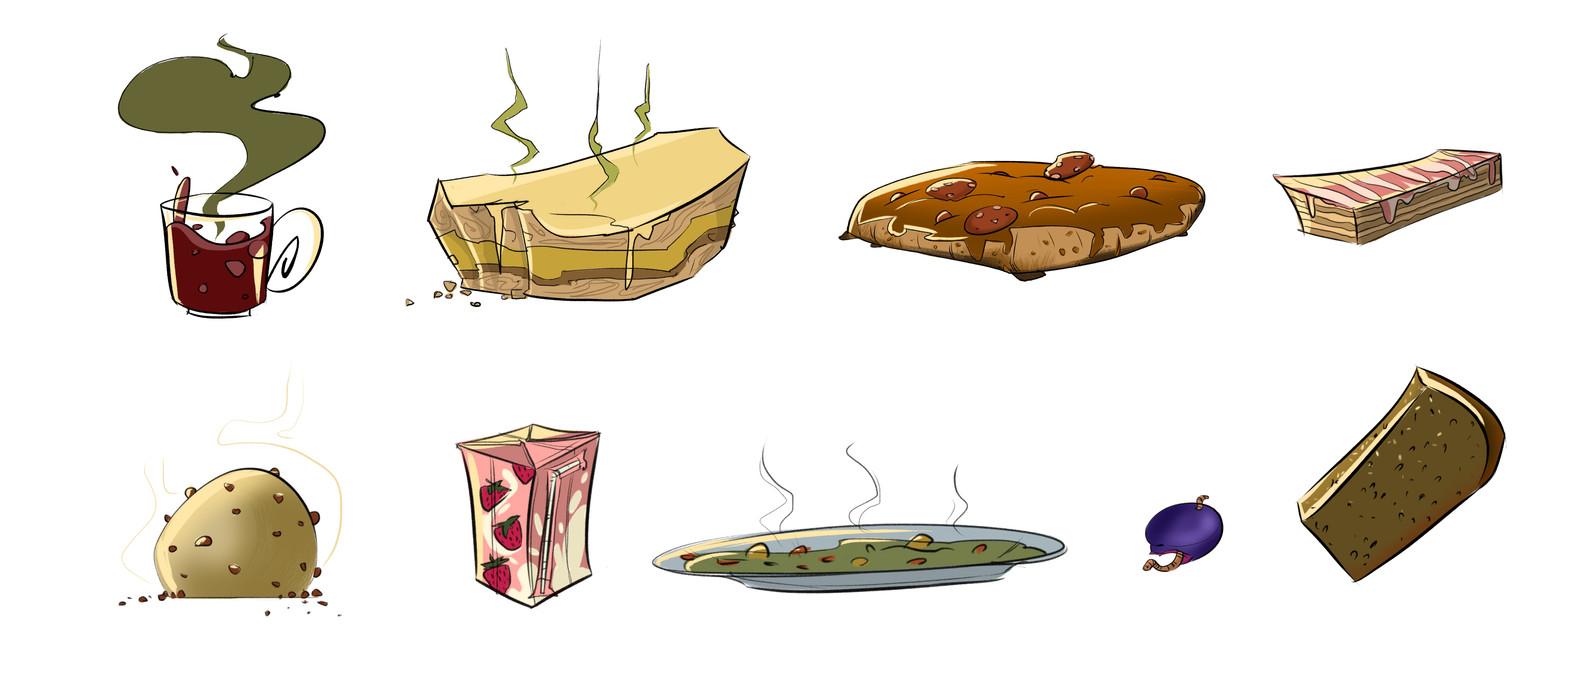 Kid's school lunch ( Inspired by my childhood school  food memories)